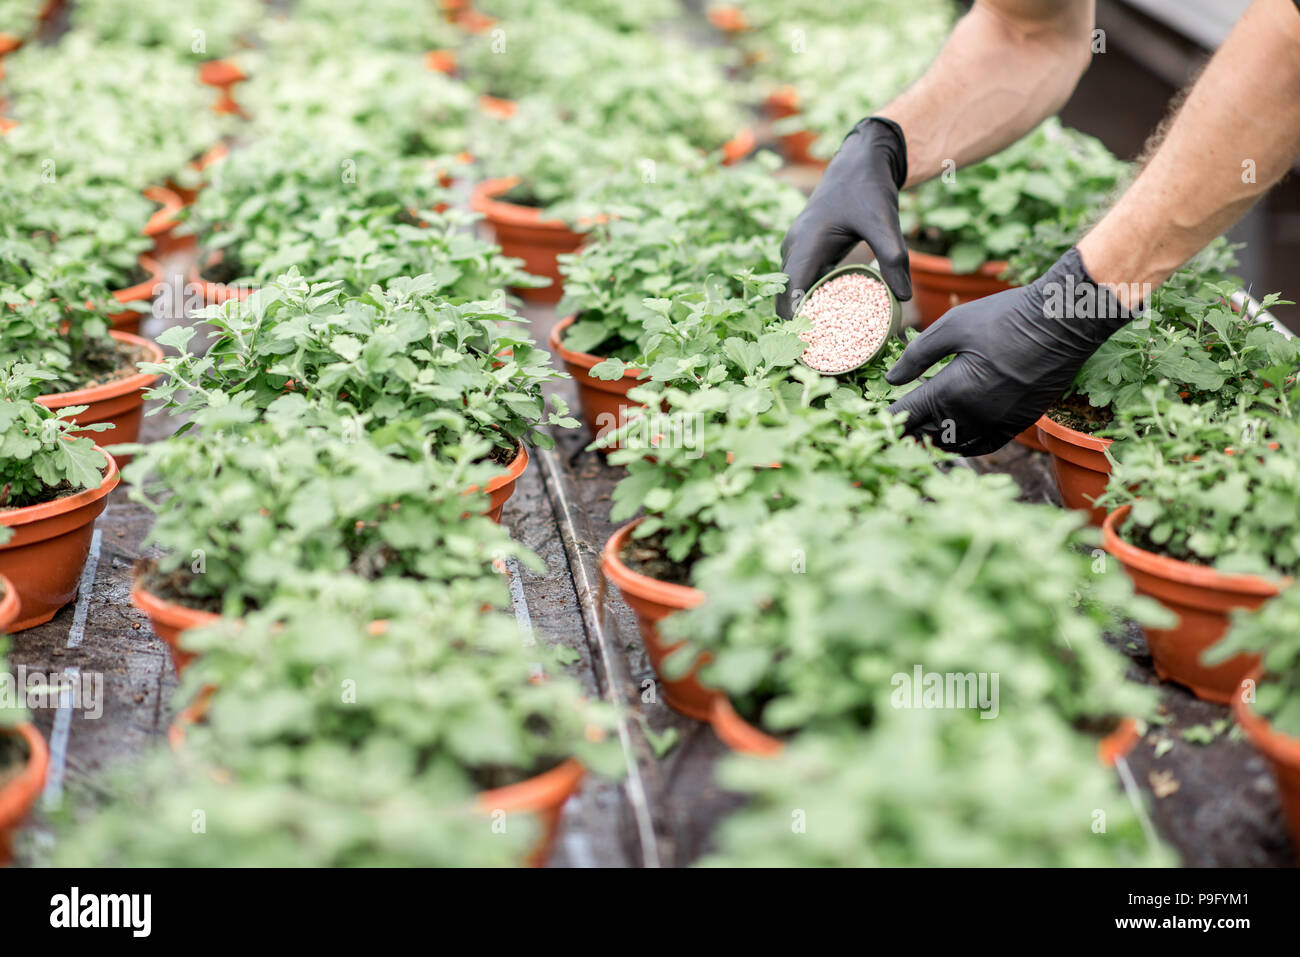 Fertilizing the plants - Stock Image